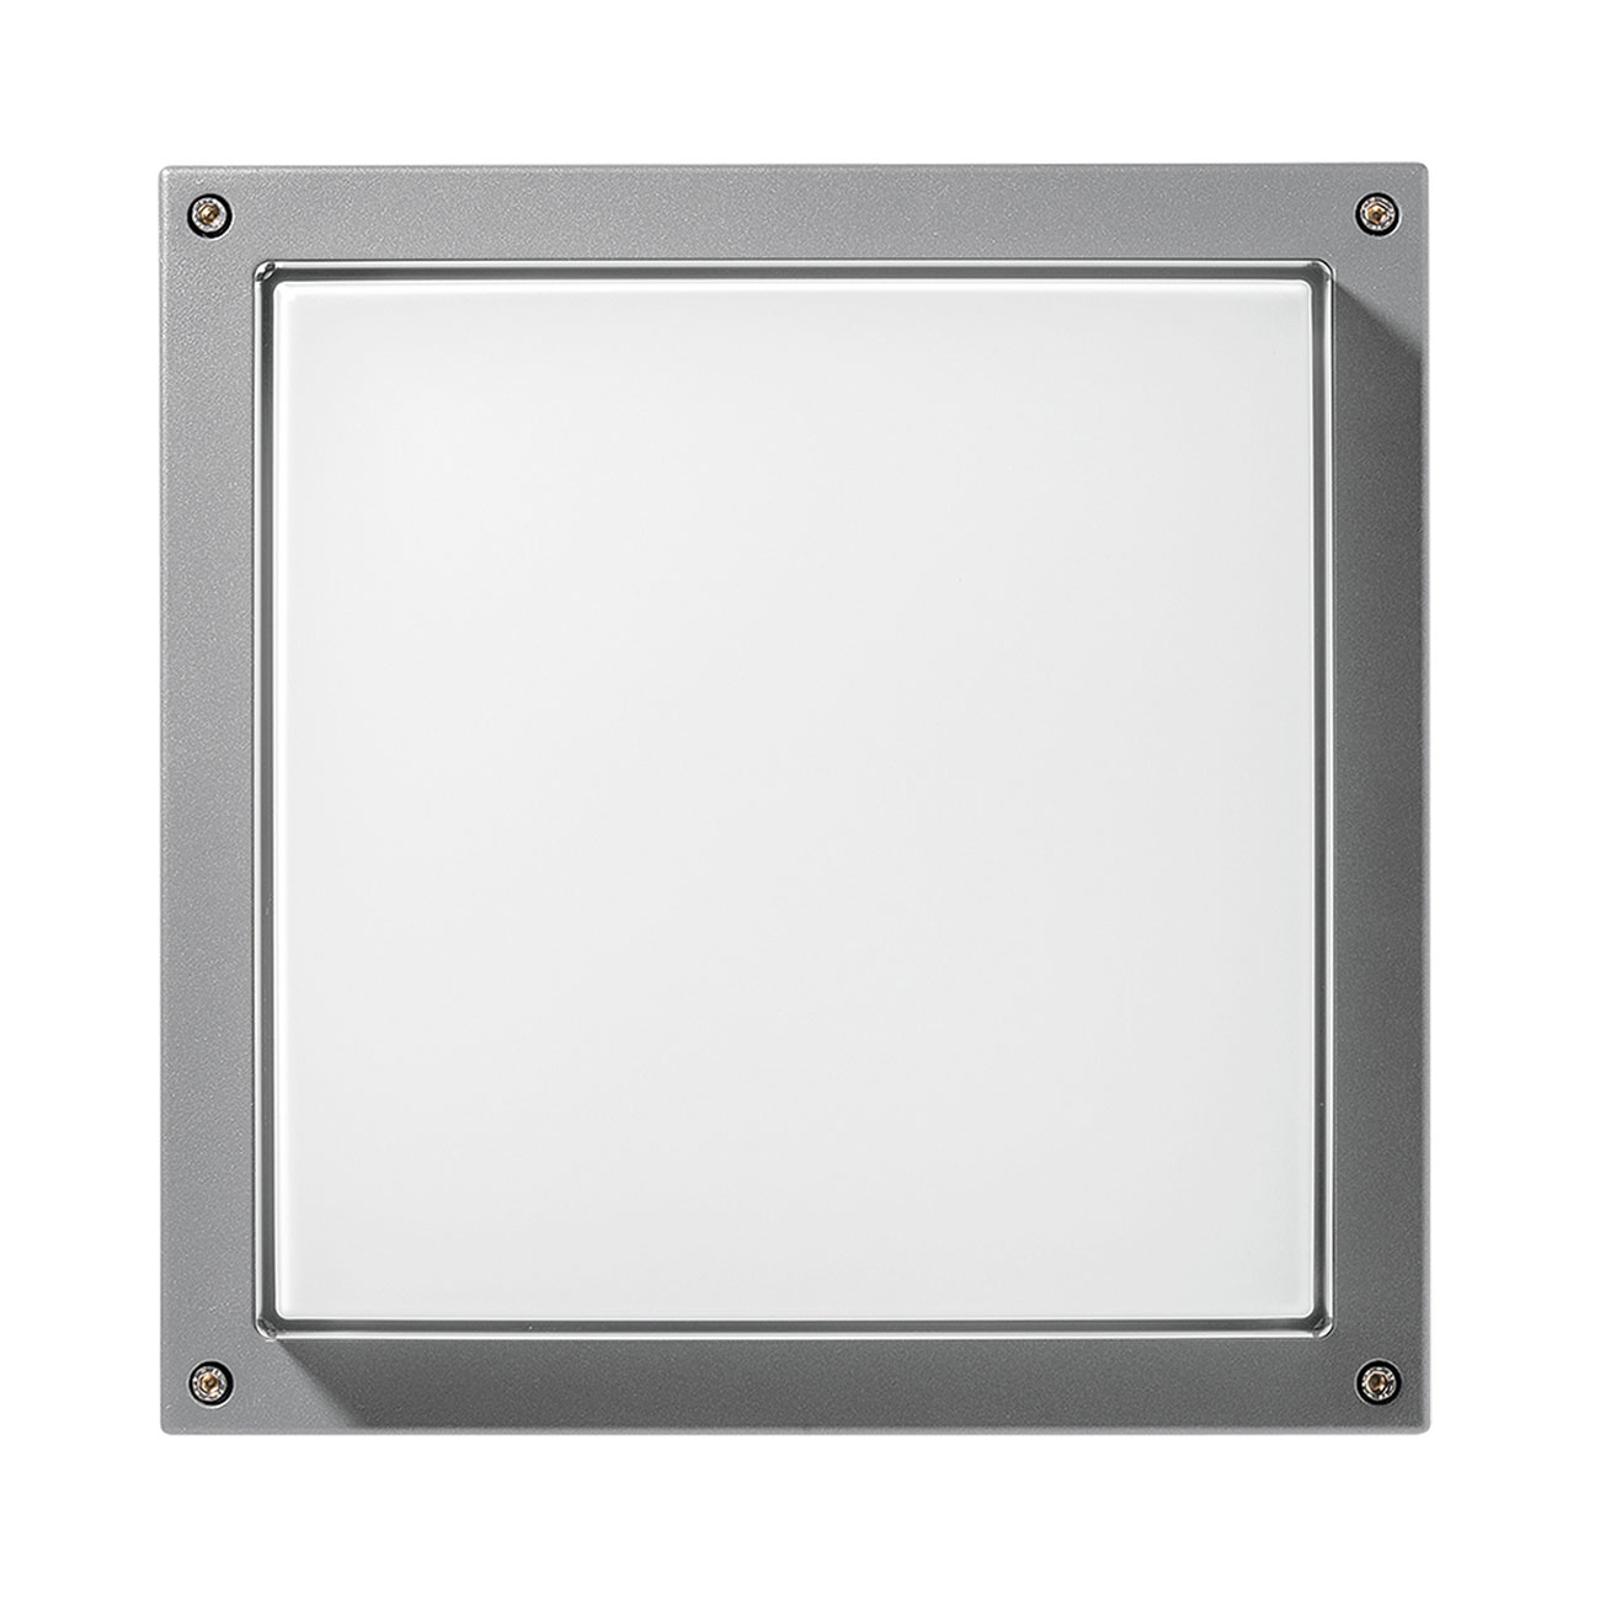 Wandlamp Bliz Square 40 3.000K grijs dimbaar